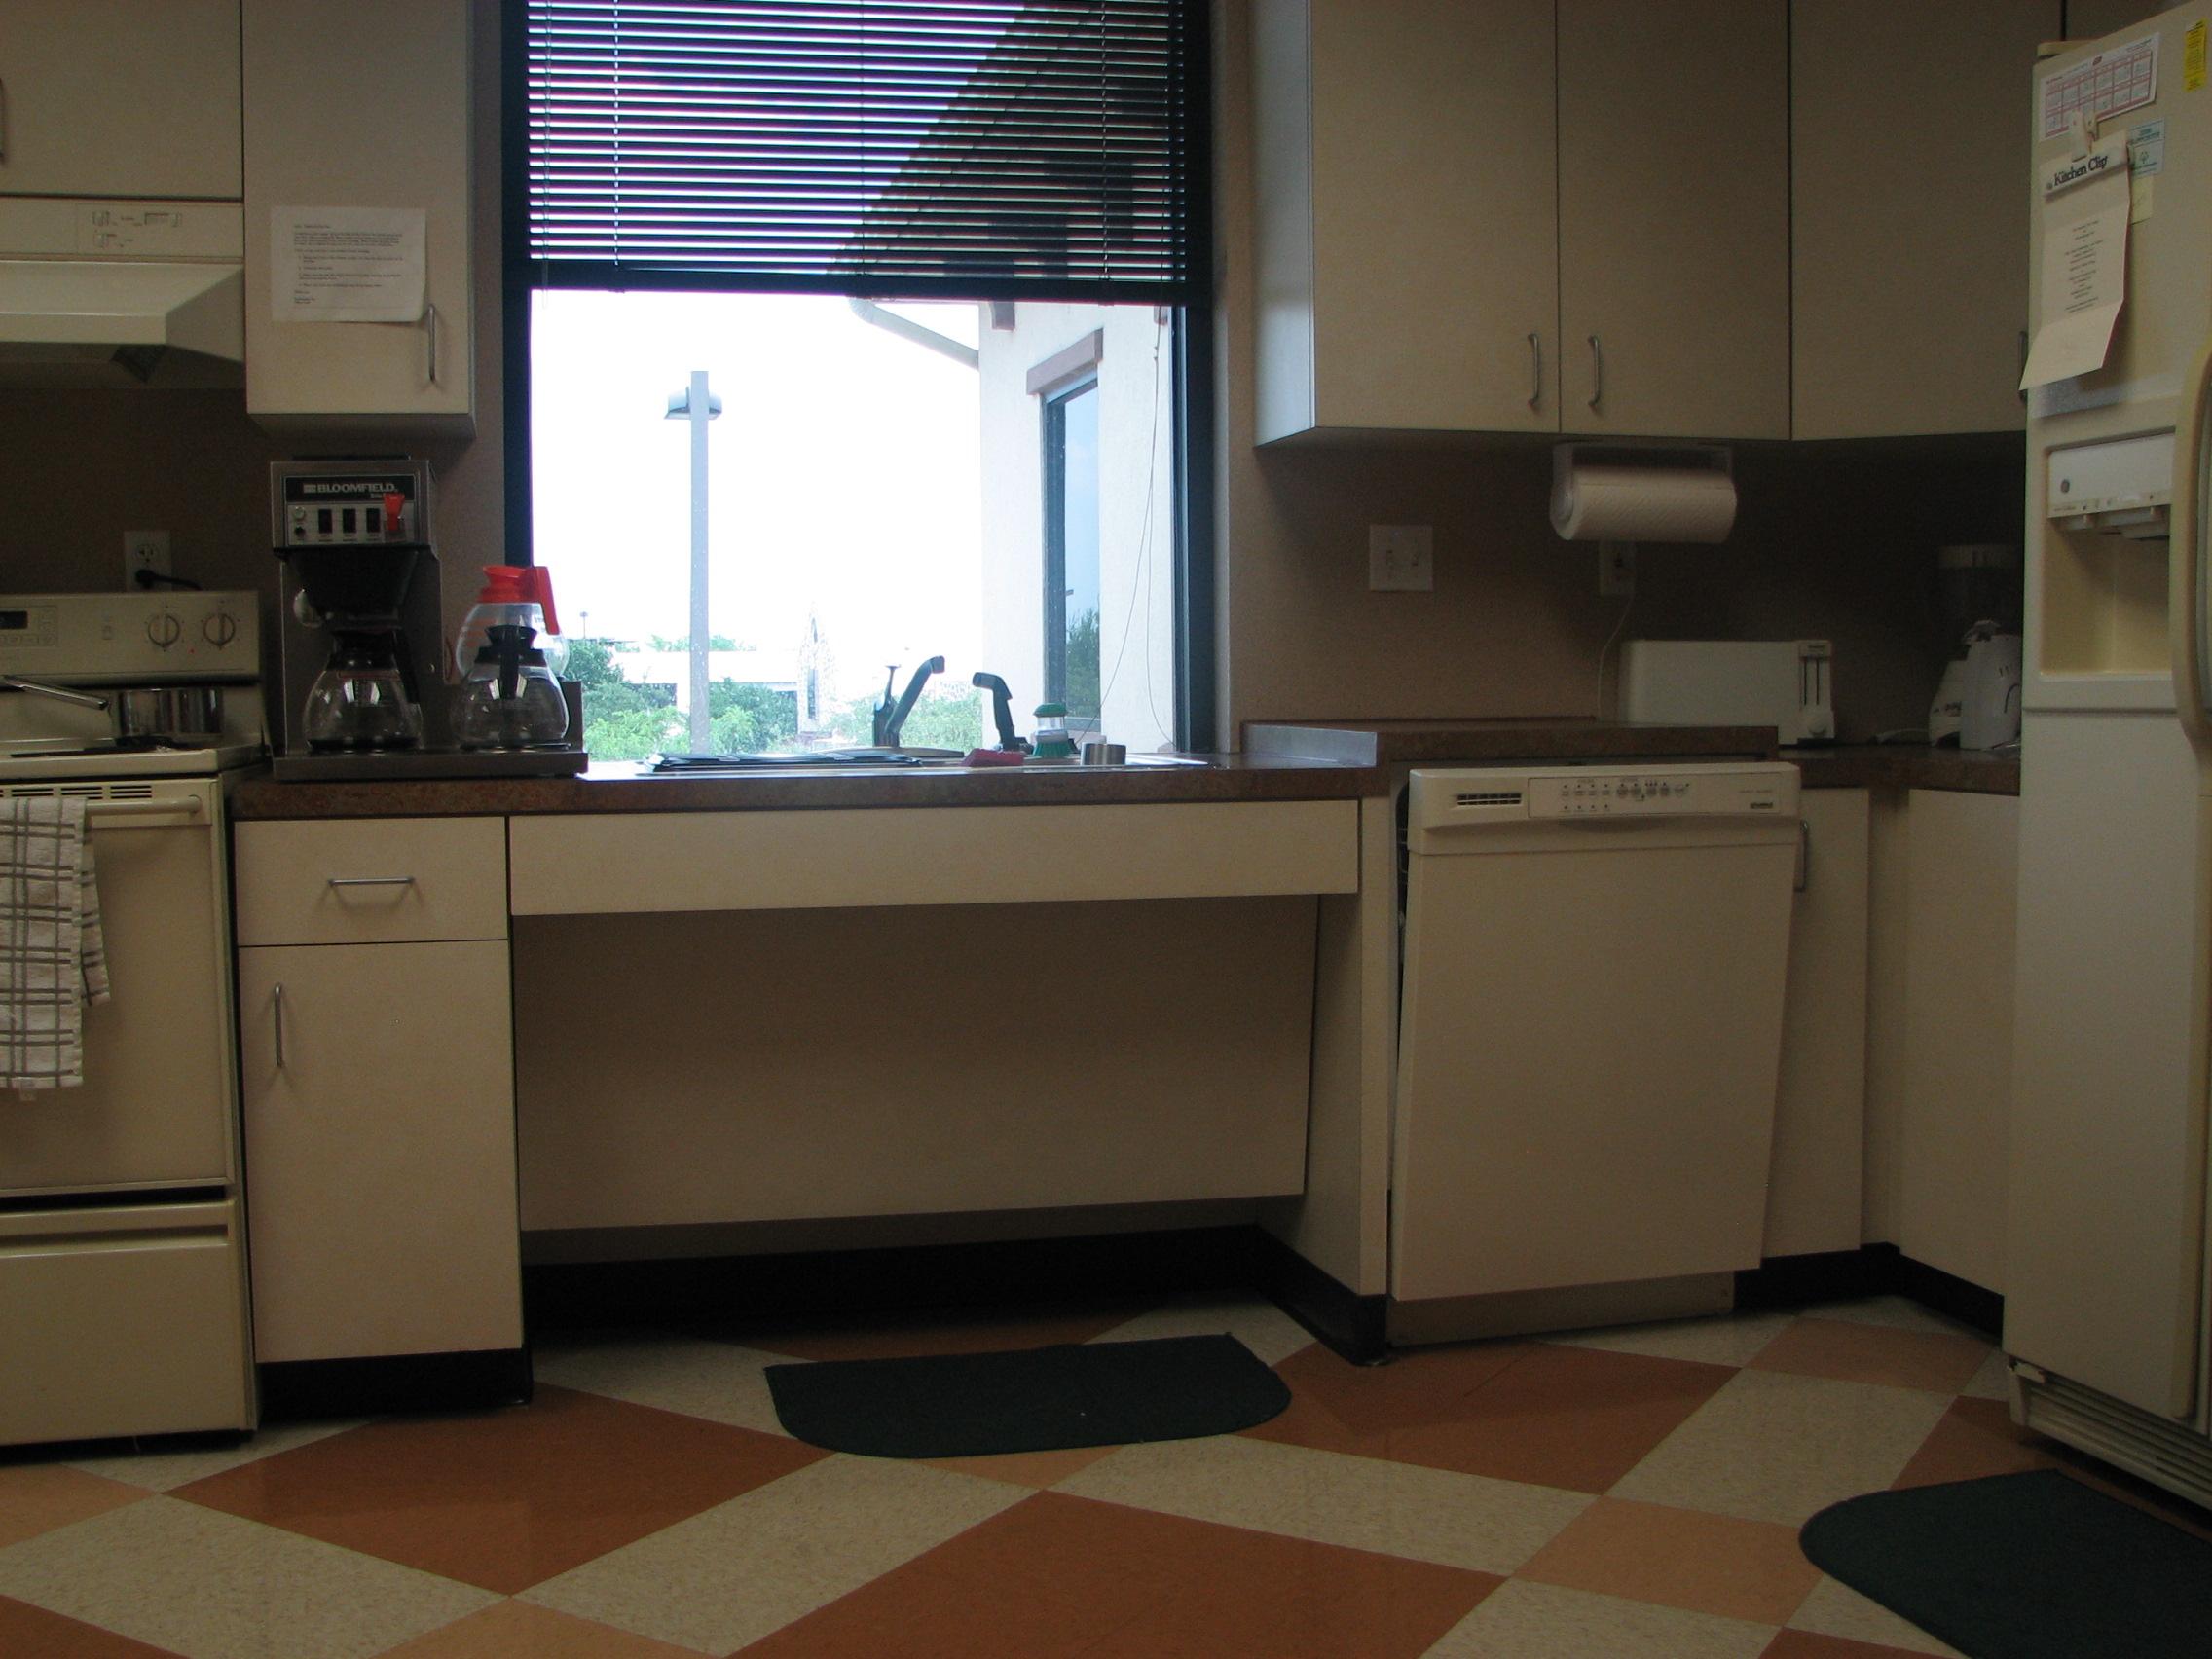 ada kitchen sink base cabinet  Home Decor